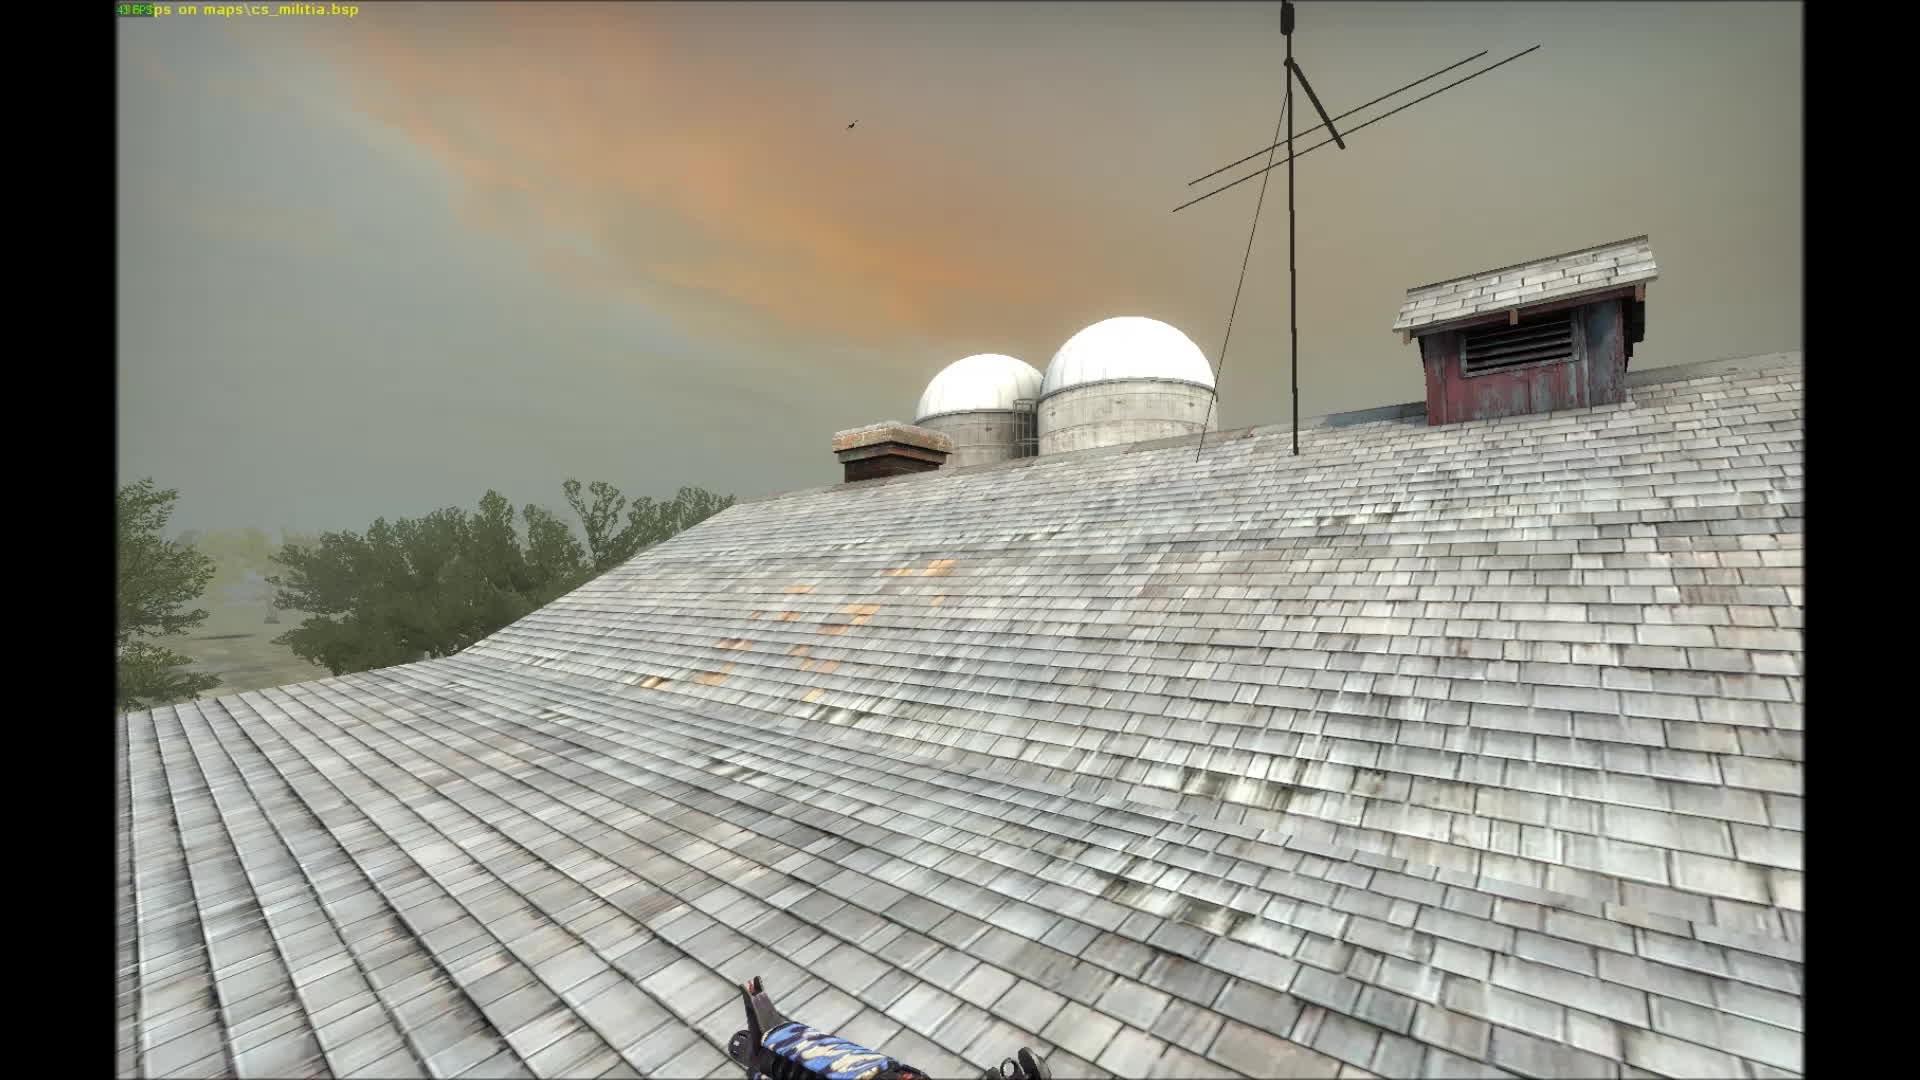 GlobalOffensiveTrade, ST FT Dragon King 0.150 Rooftop Showcase GIFs